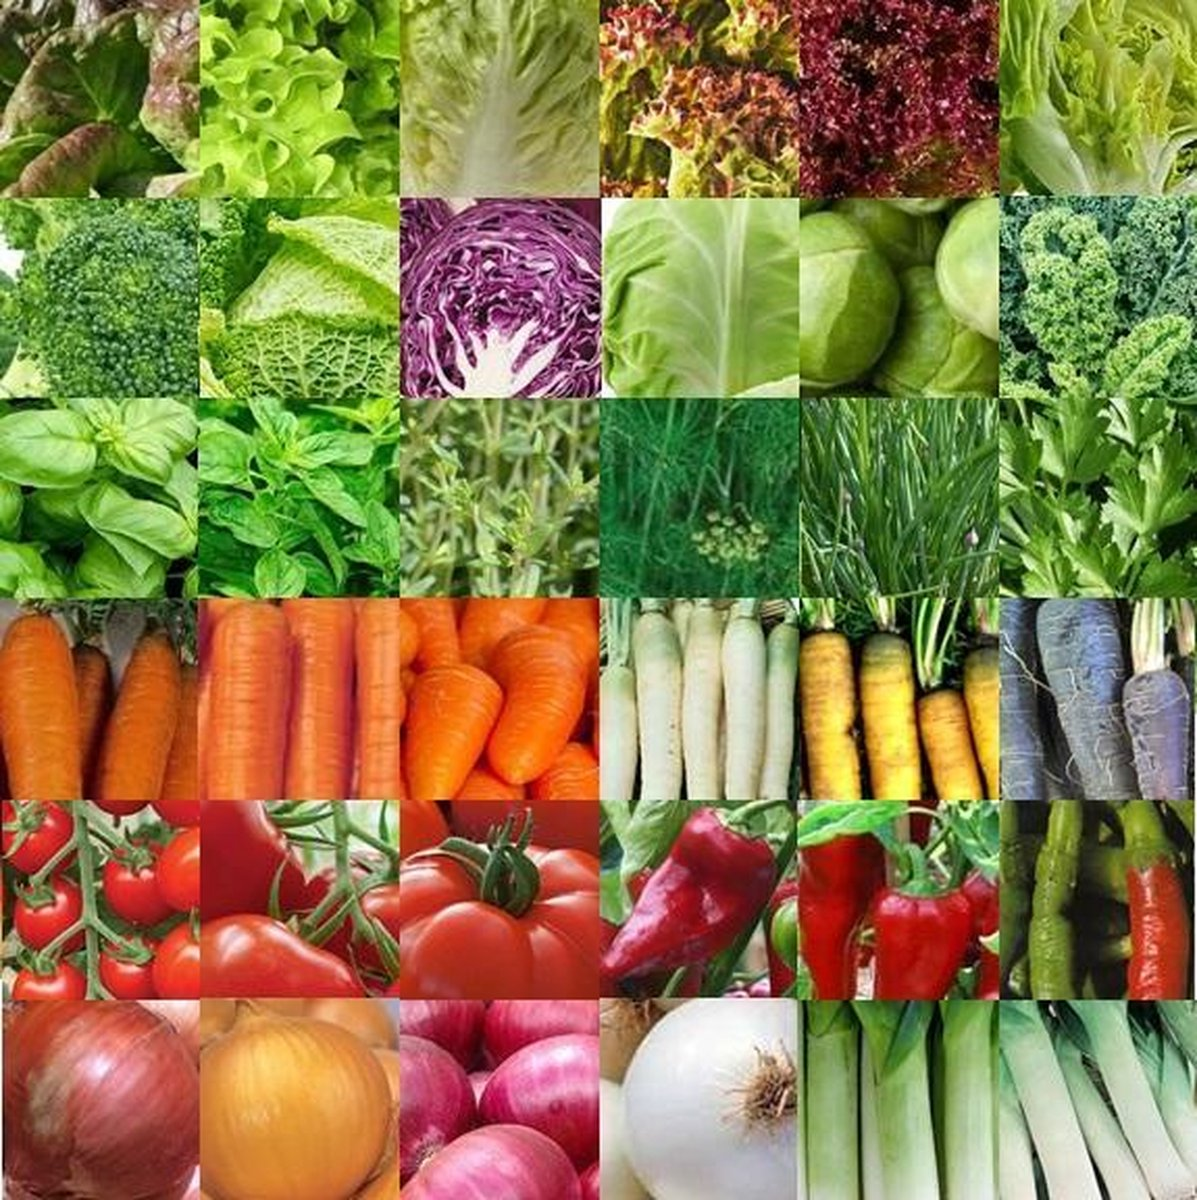 Groentezaden assortiment 36 soorten (sla, kolen, kruiden, wortels, tomaten, paprika, uien, prei) zaa